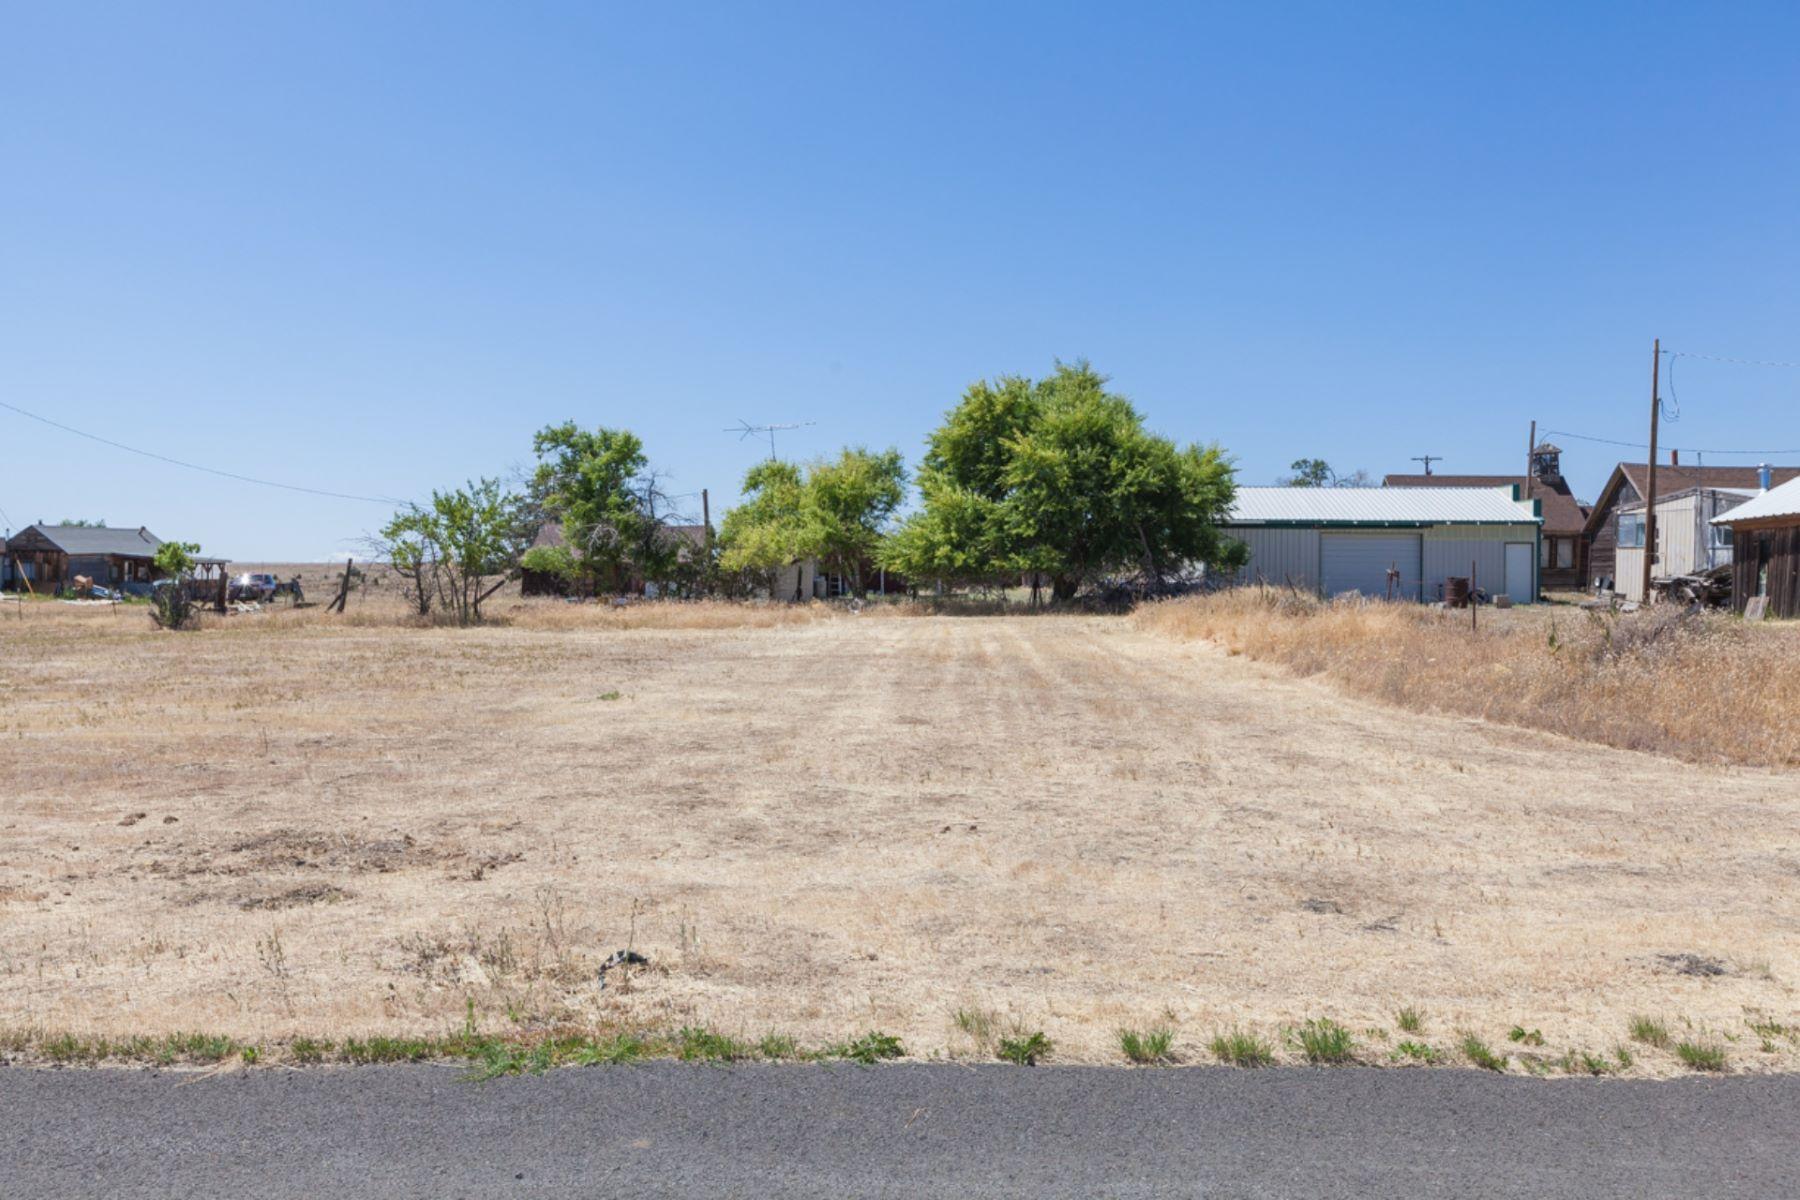 Land for Active at E Street Shaniko, OR 97057 E Street Shaniko, Oregon 97057 United States